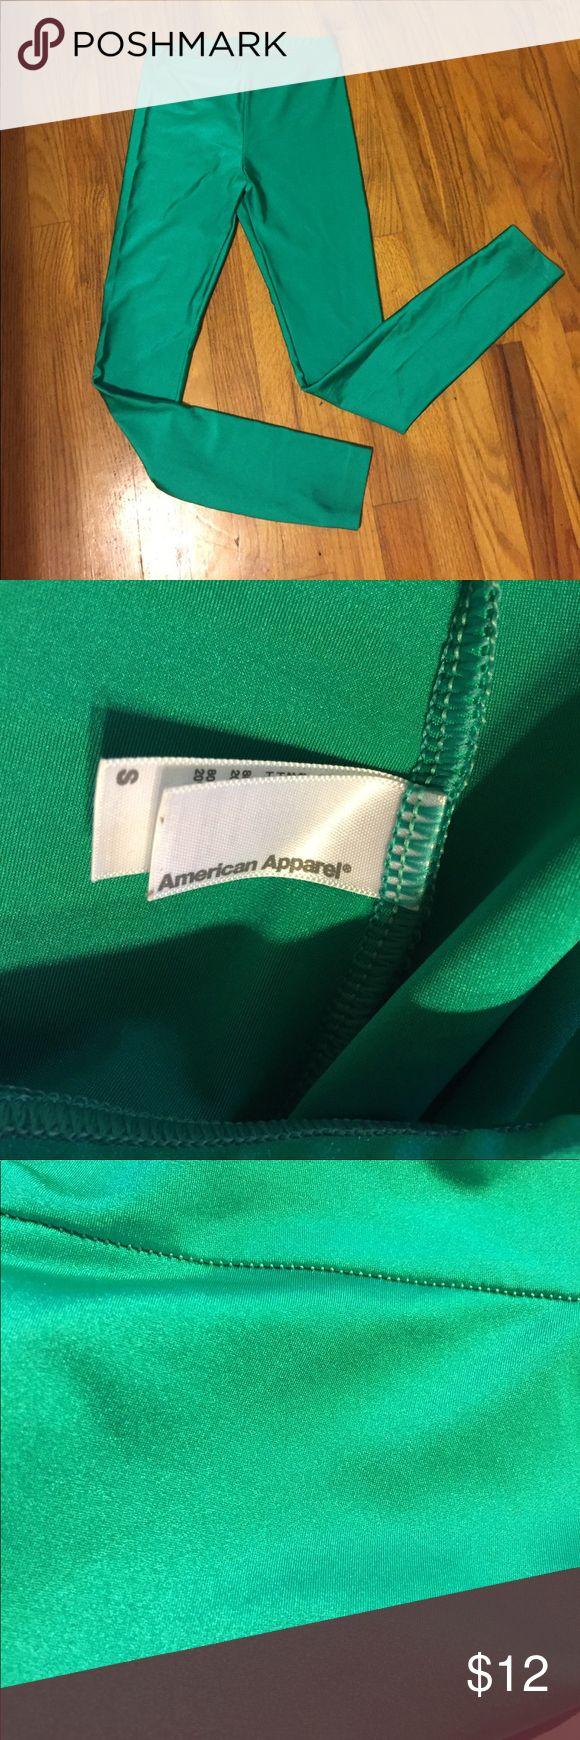 American apparel shiny green leggings Silky shiny green American apparel leggings. American Apparel Pants Leggings